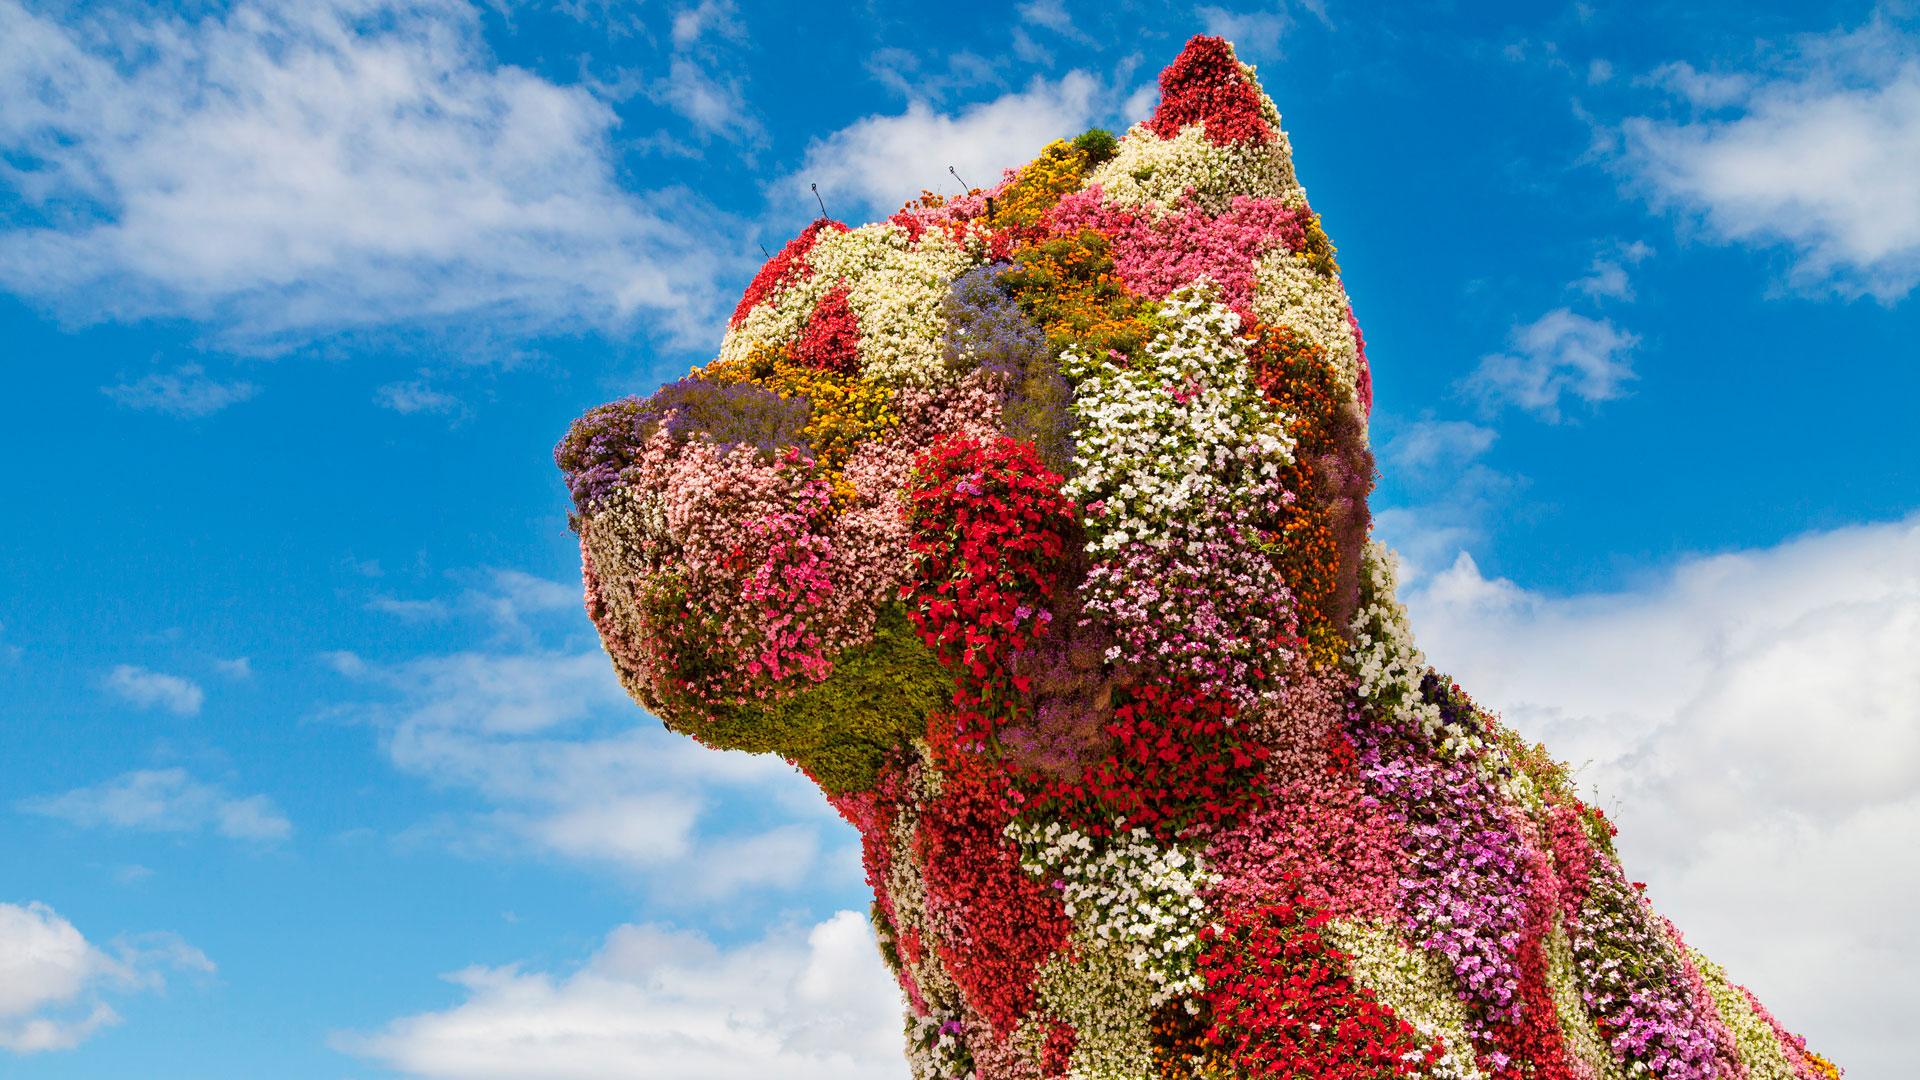 Puppy la mascota del Museo Guggenheim de Bilbao